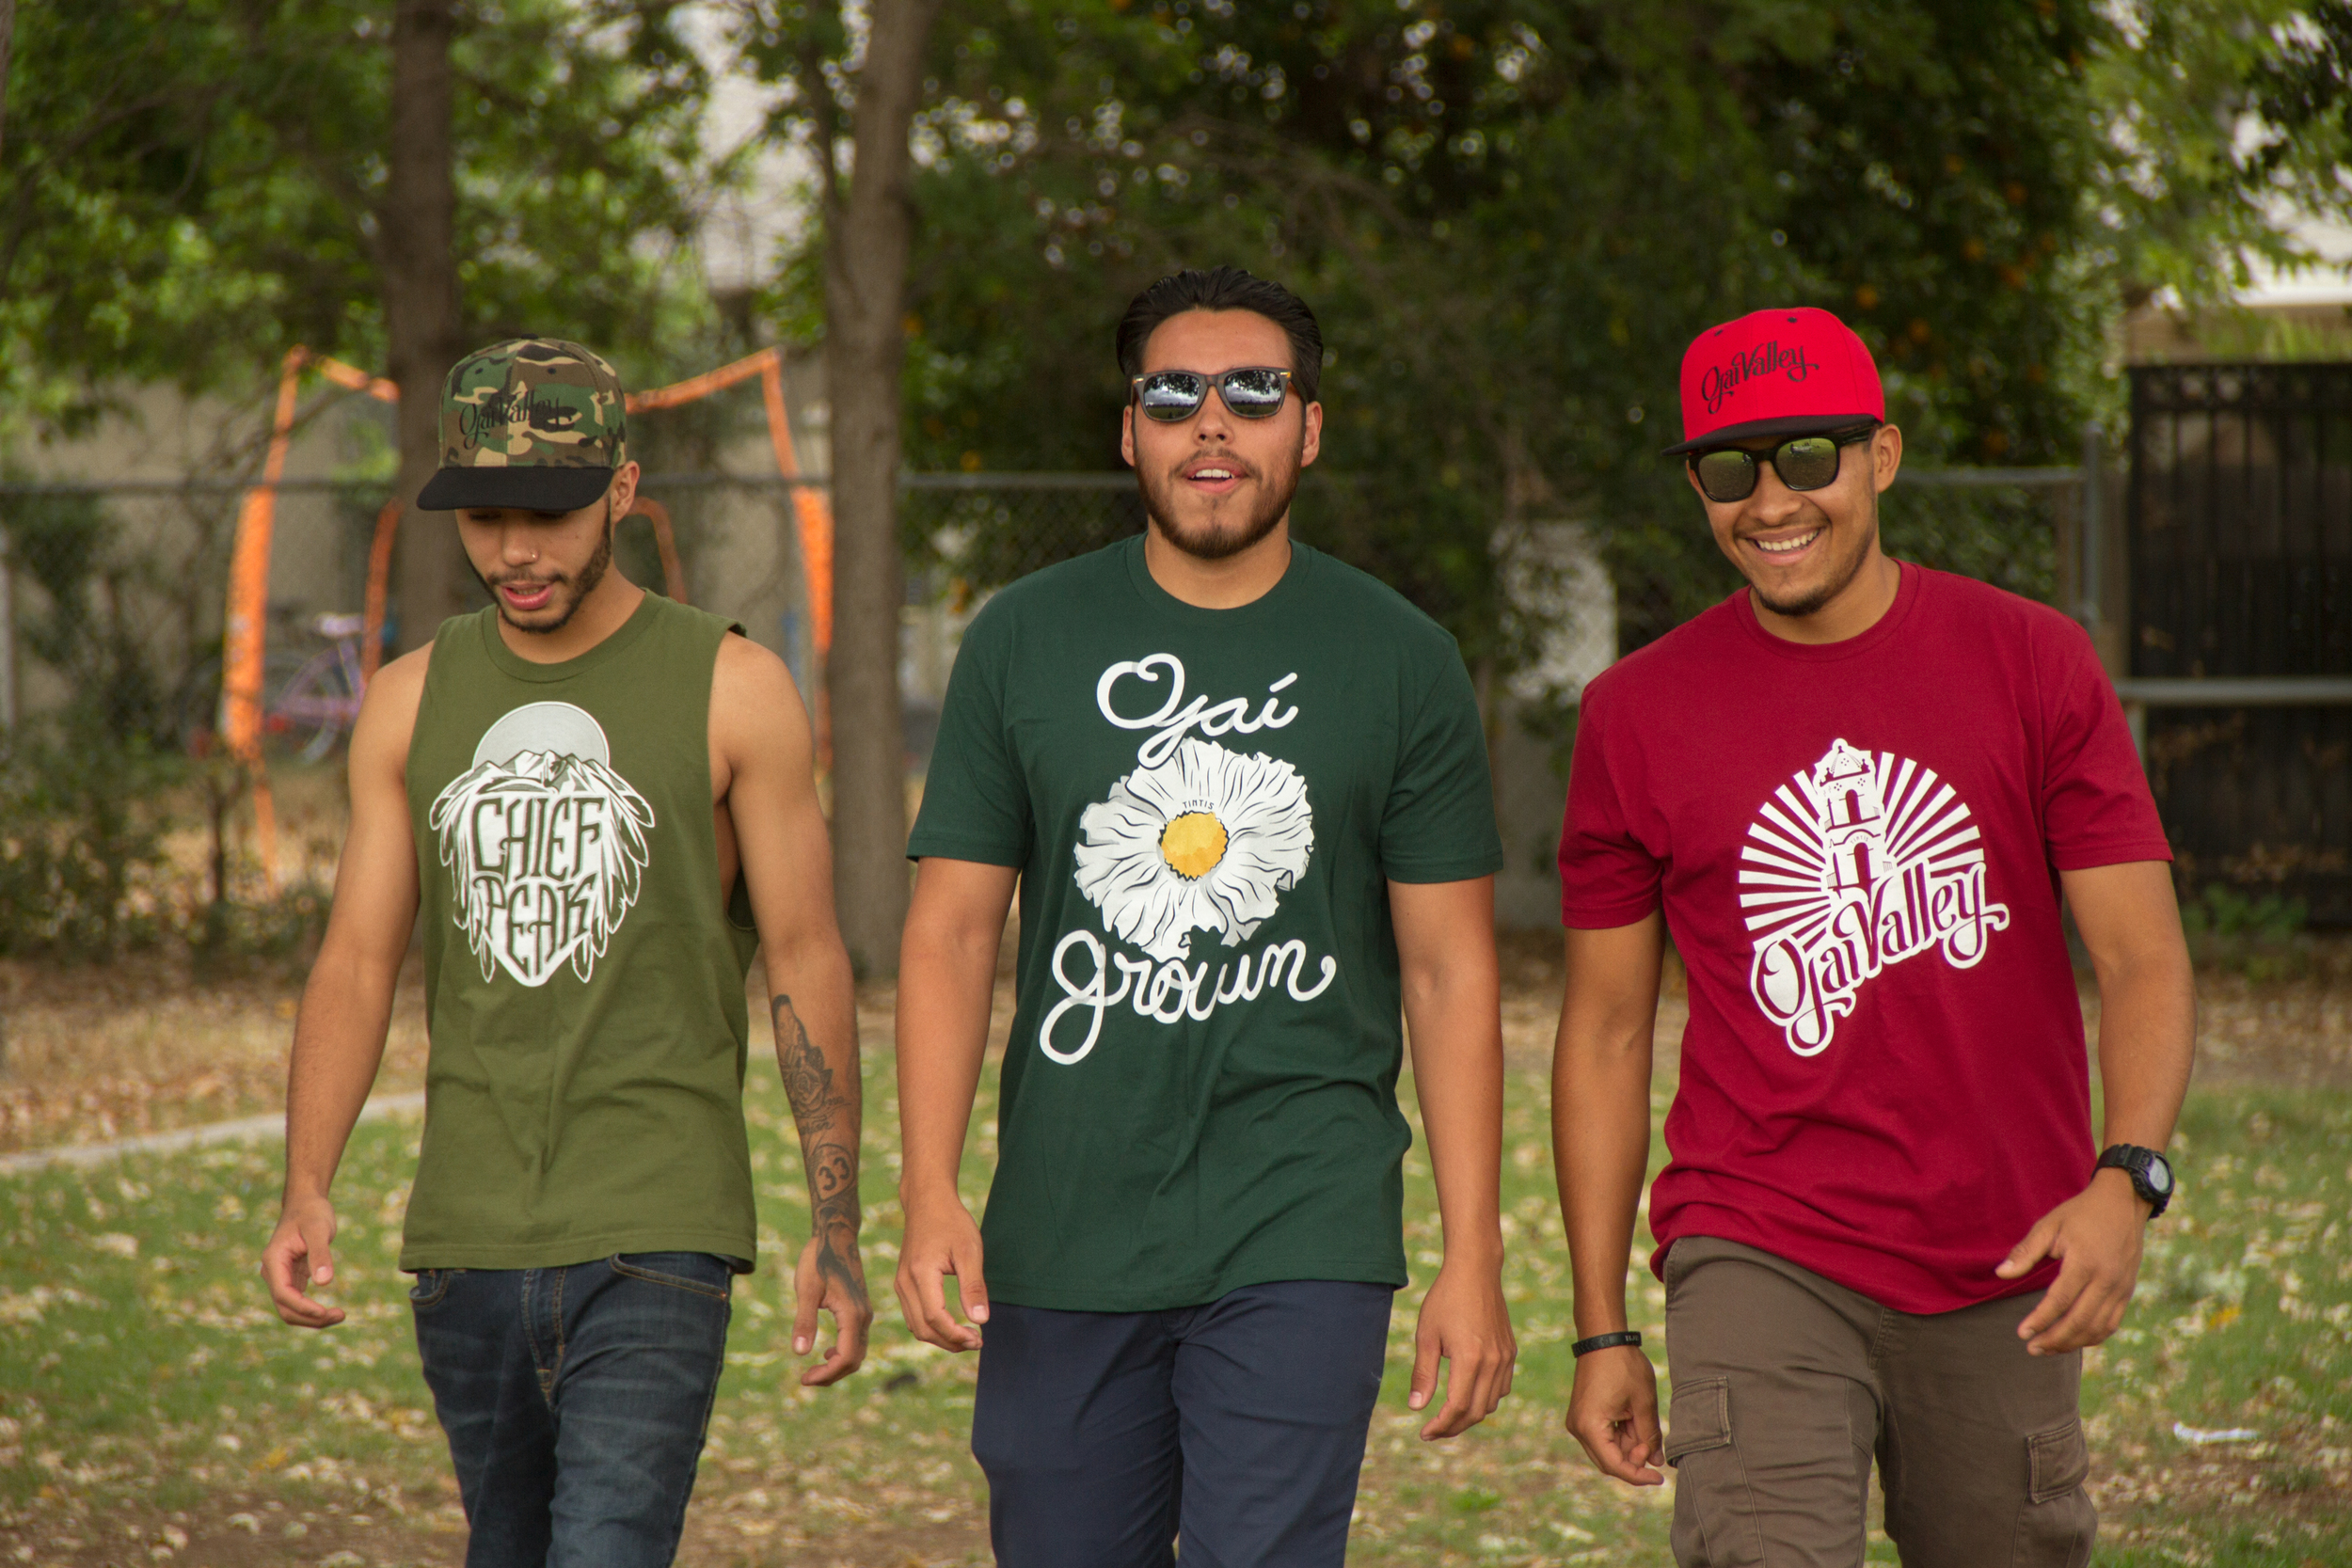 Ojai Shirts, Ojai Day Shirts, Ojai T-shirts, Ojai Tees